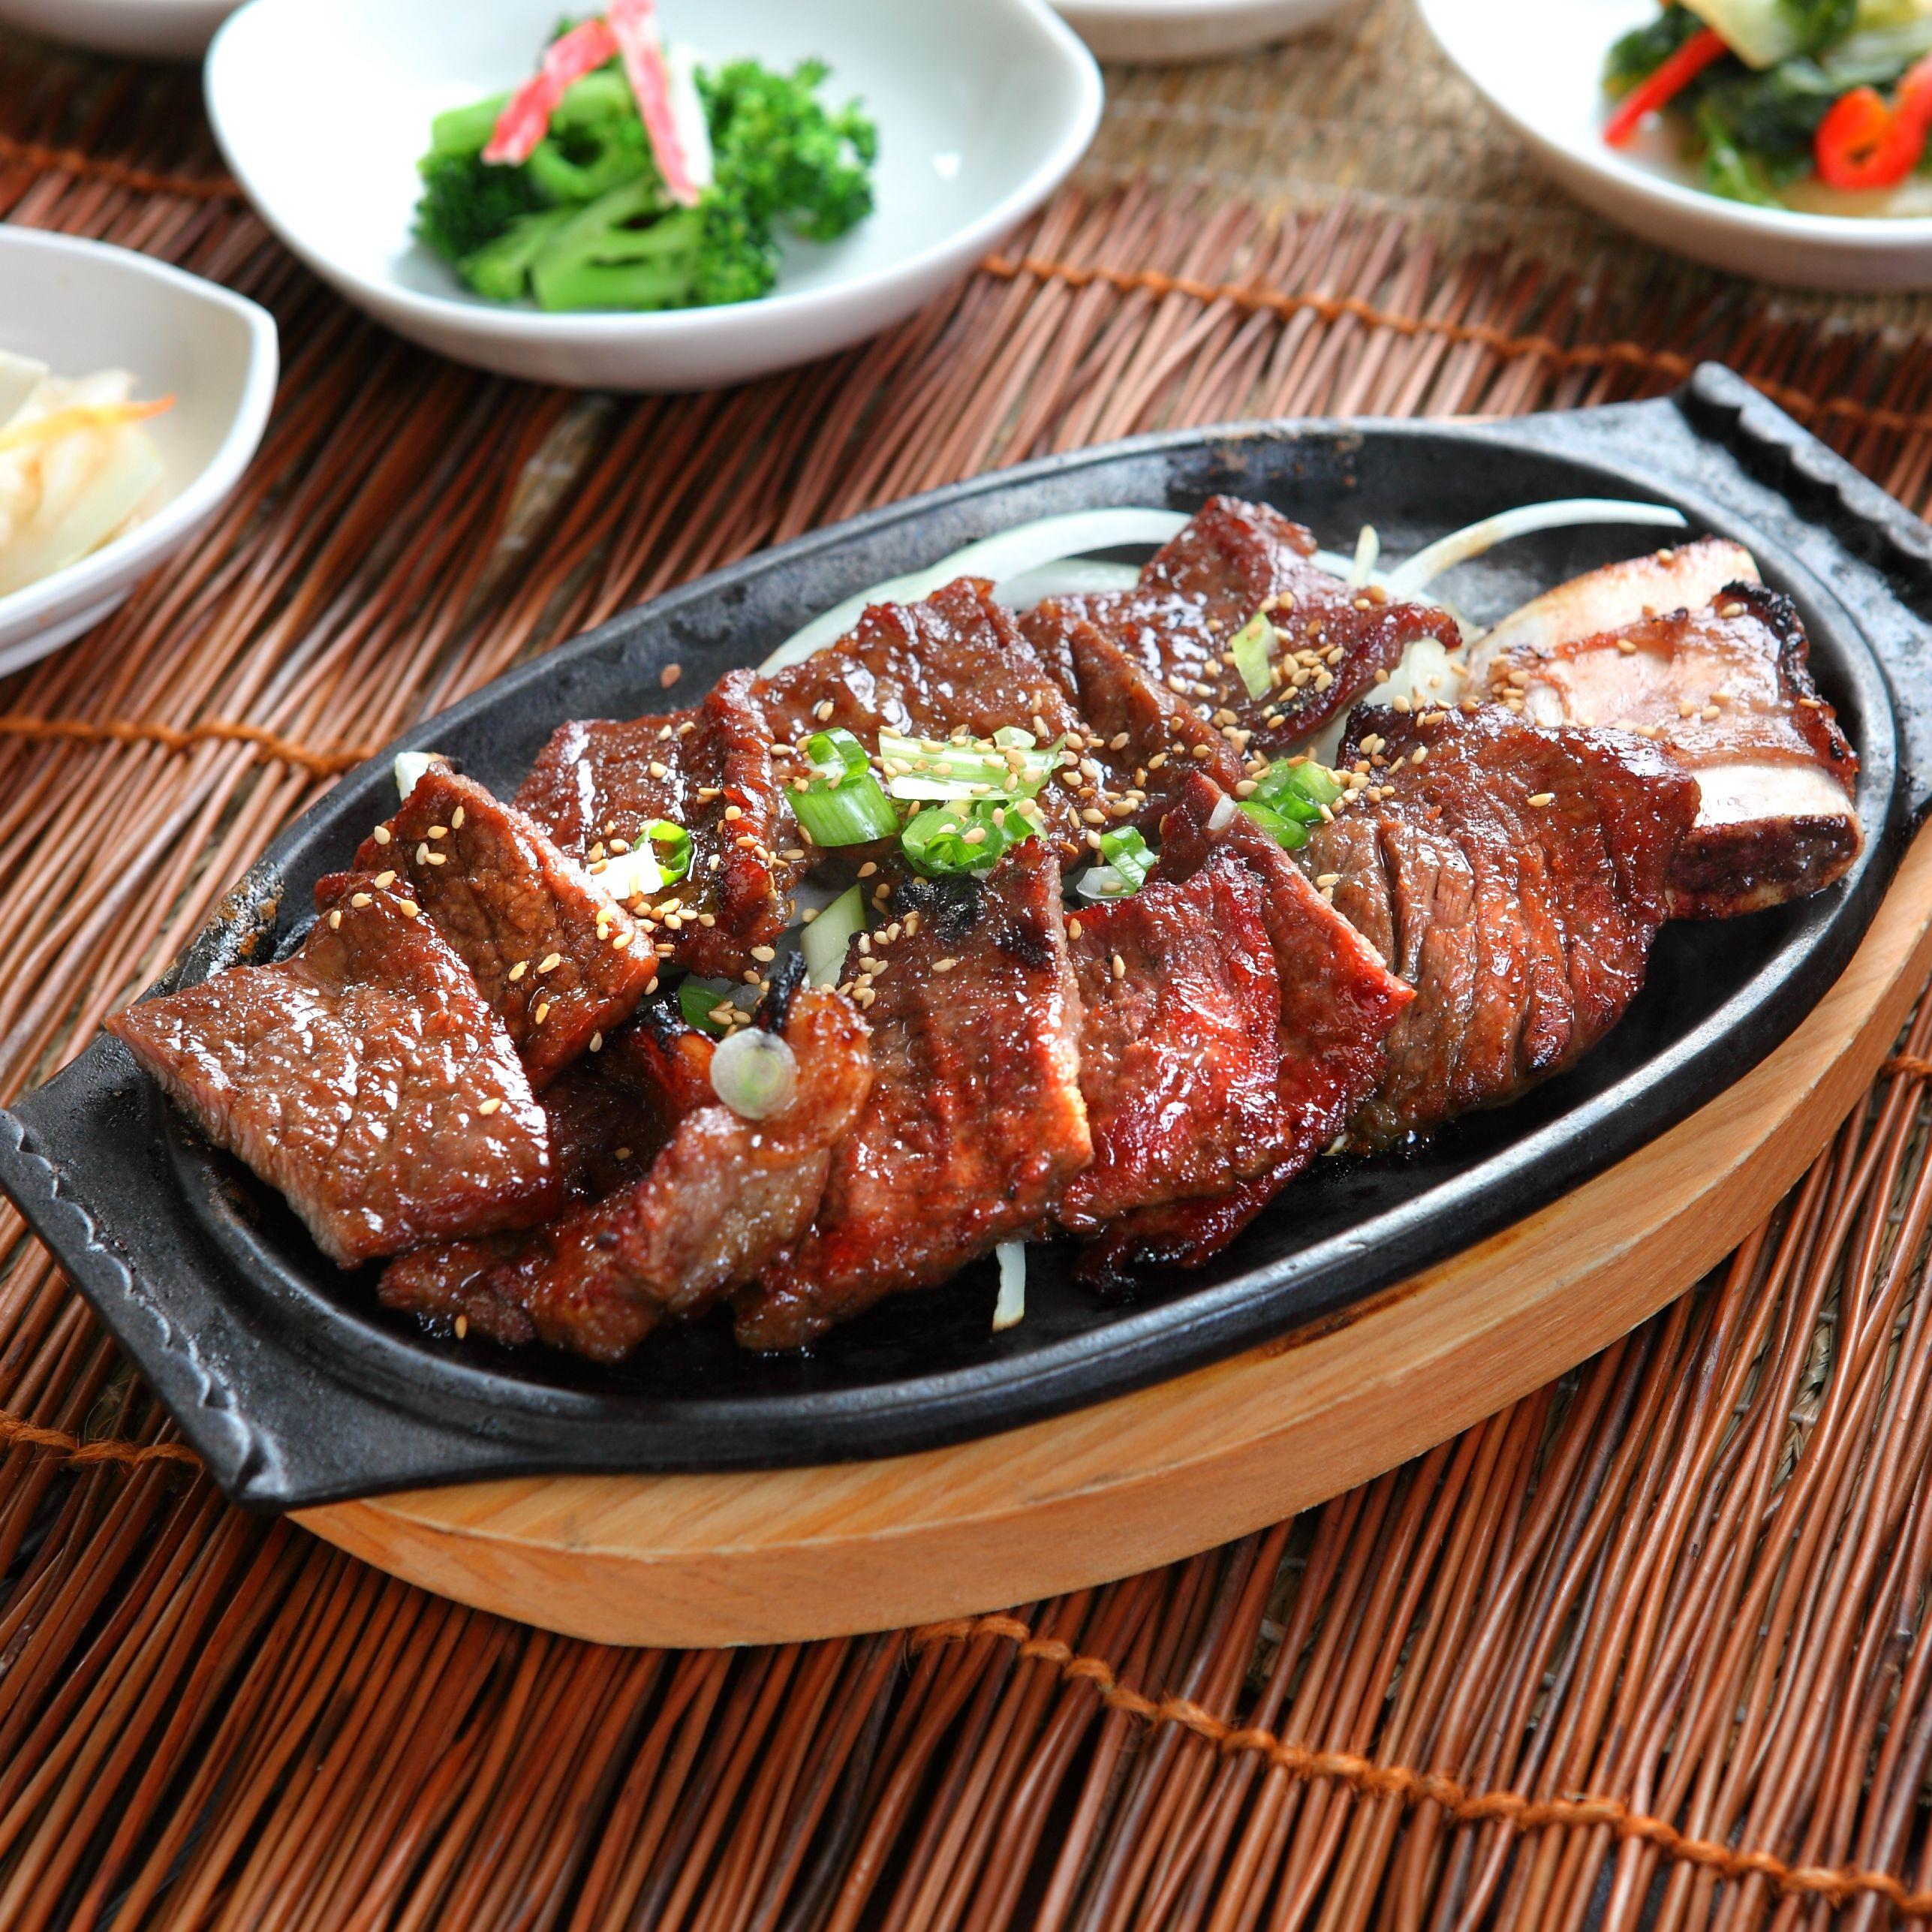 Recipe to Make Galbi or Korean Grilled Short Ribs